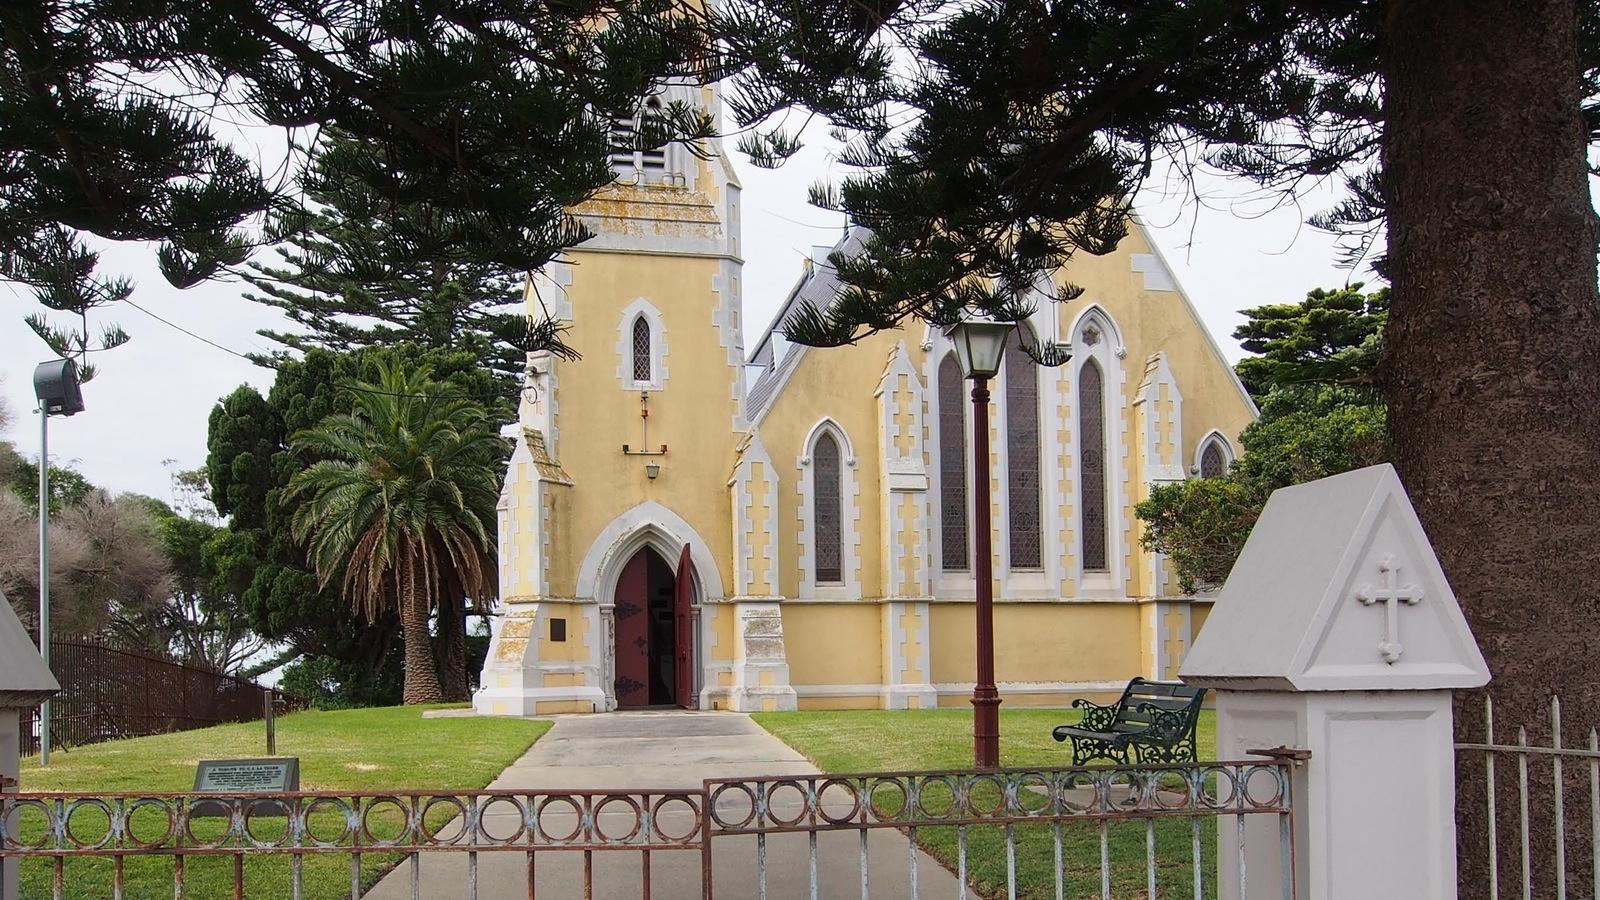 Painted Church, Queenscliff